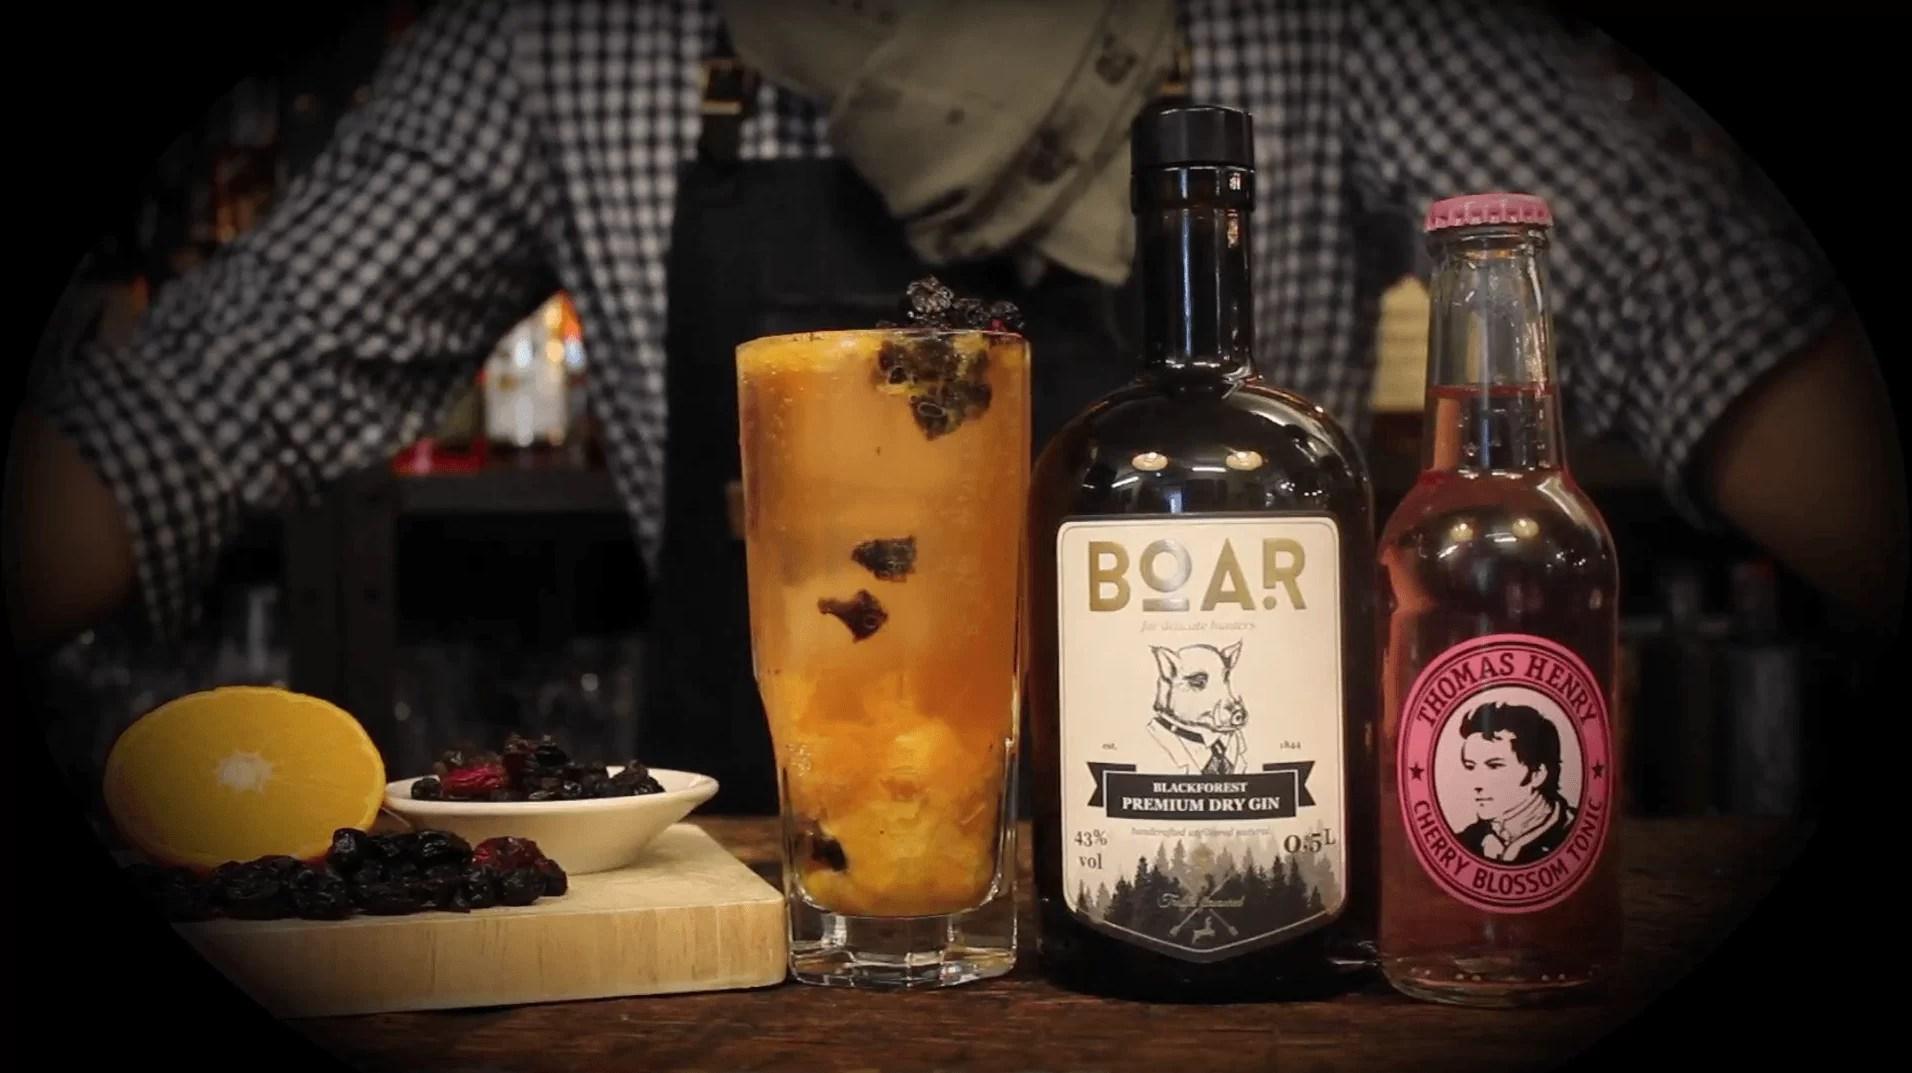 #FridayHighball No. 30 - Wild Cherry Boar